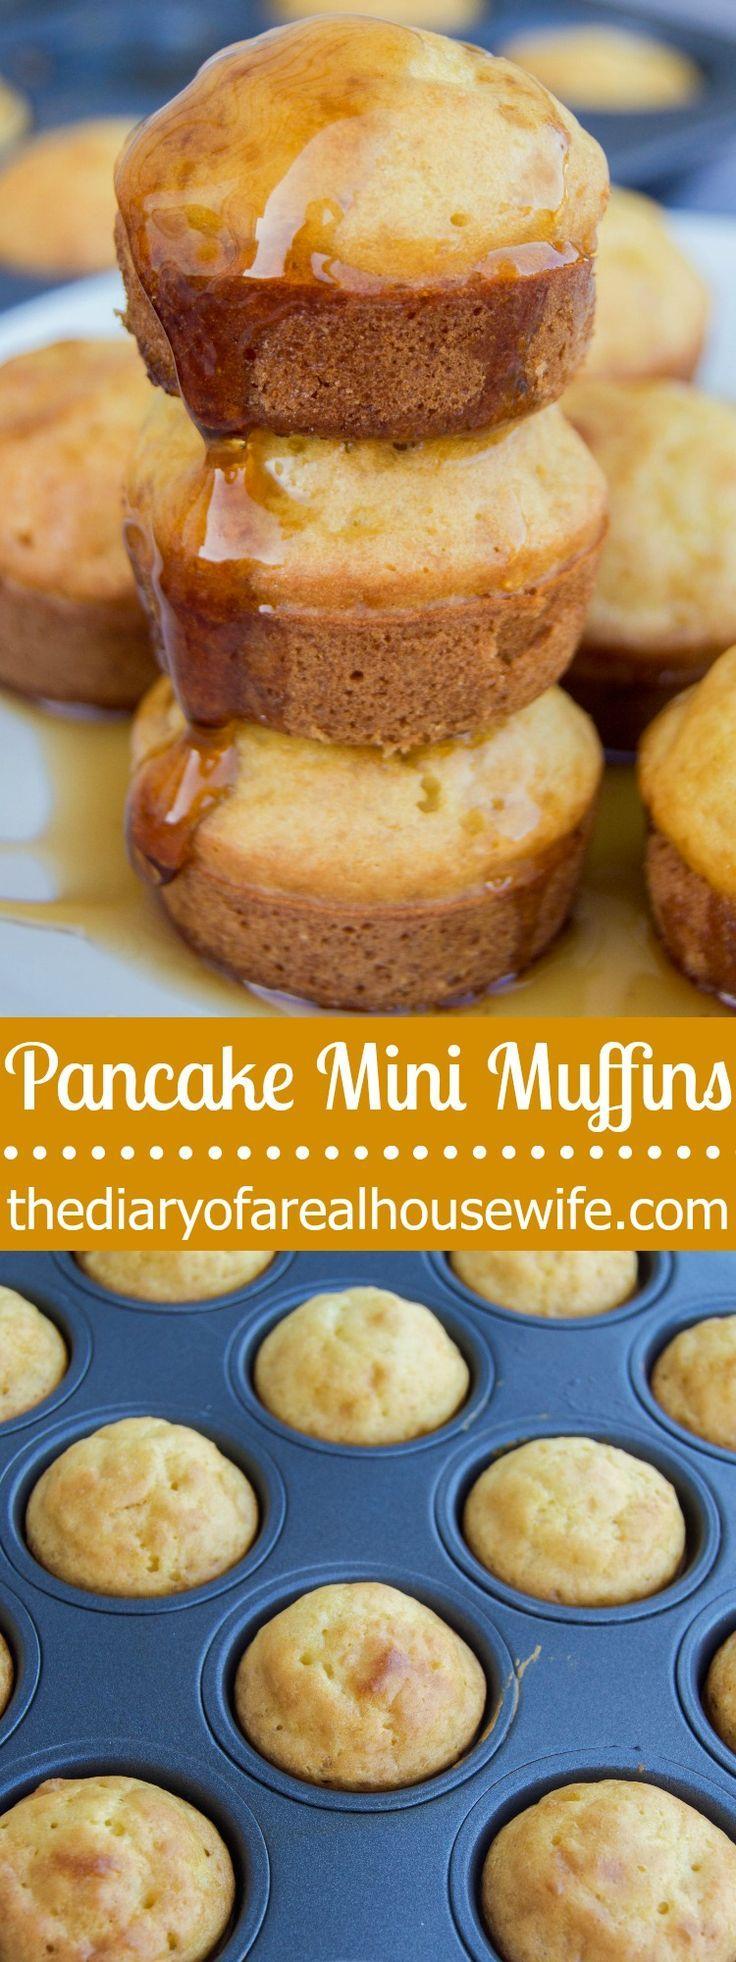 Pancake Mini Muffins. So yumm!! The best recipe ever!